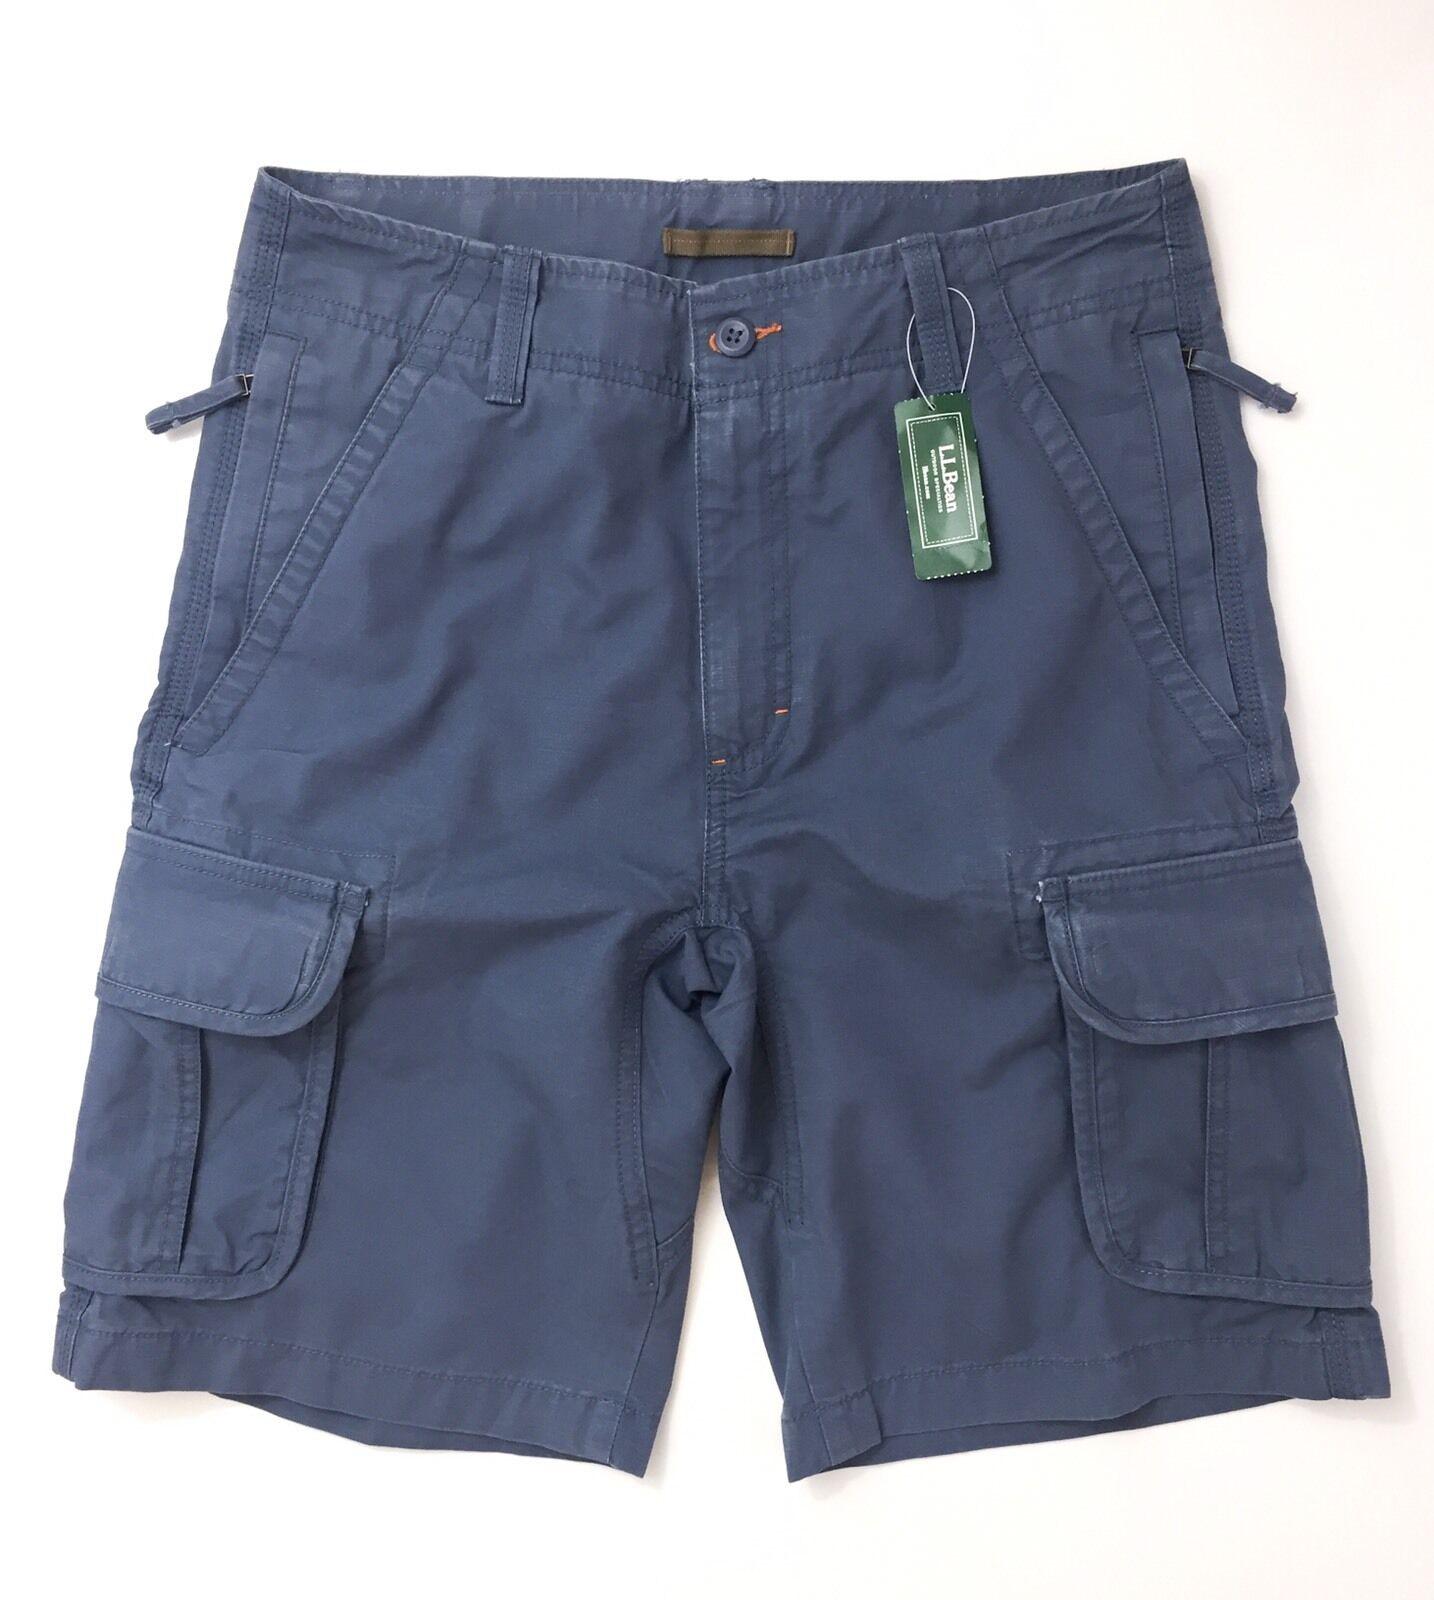 LL Bean Men's Allagash Cargo Shorts Size W30